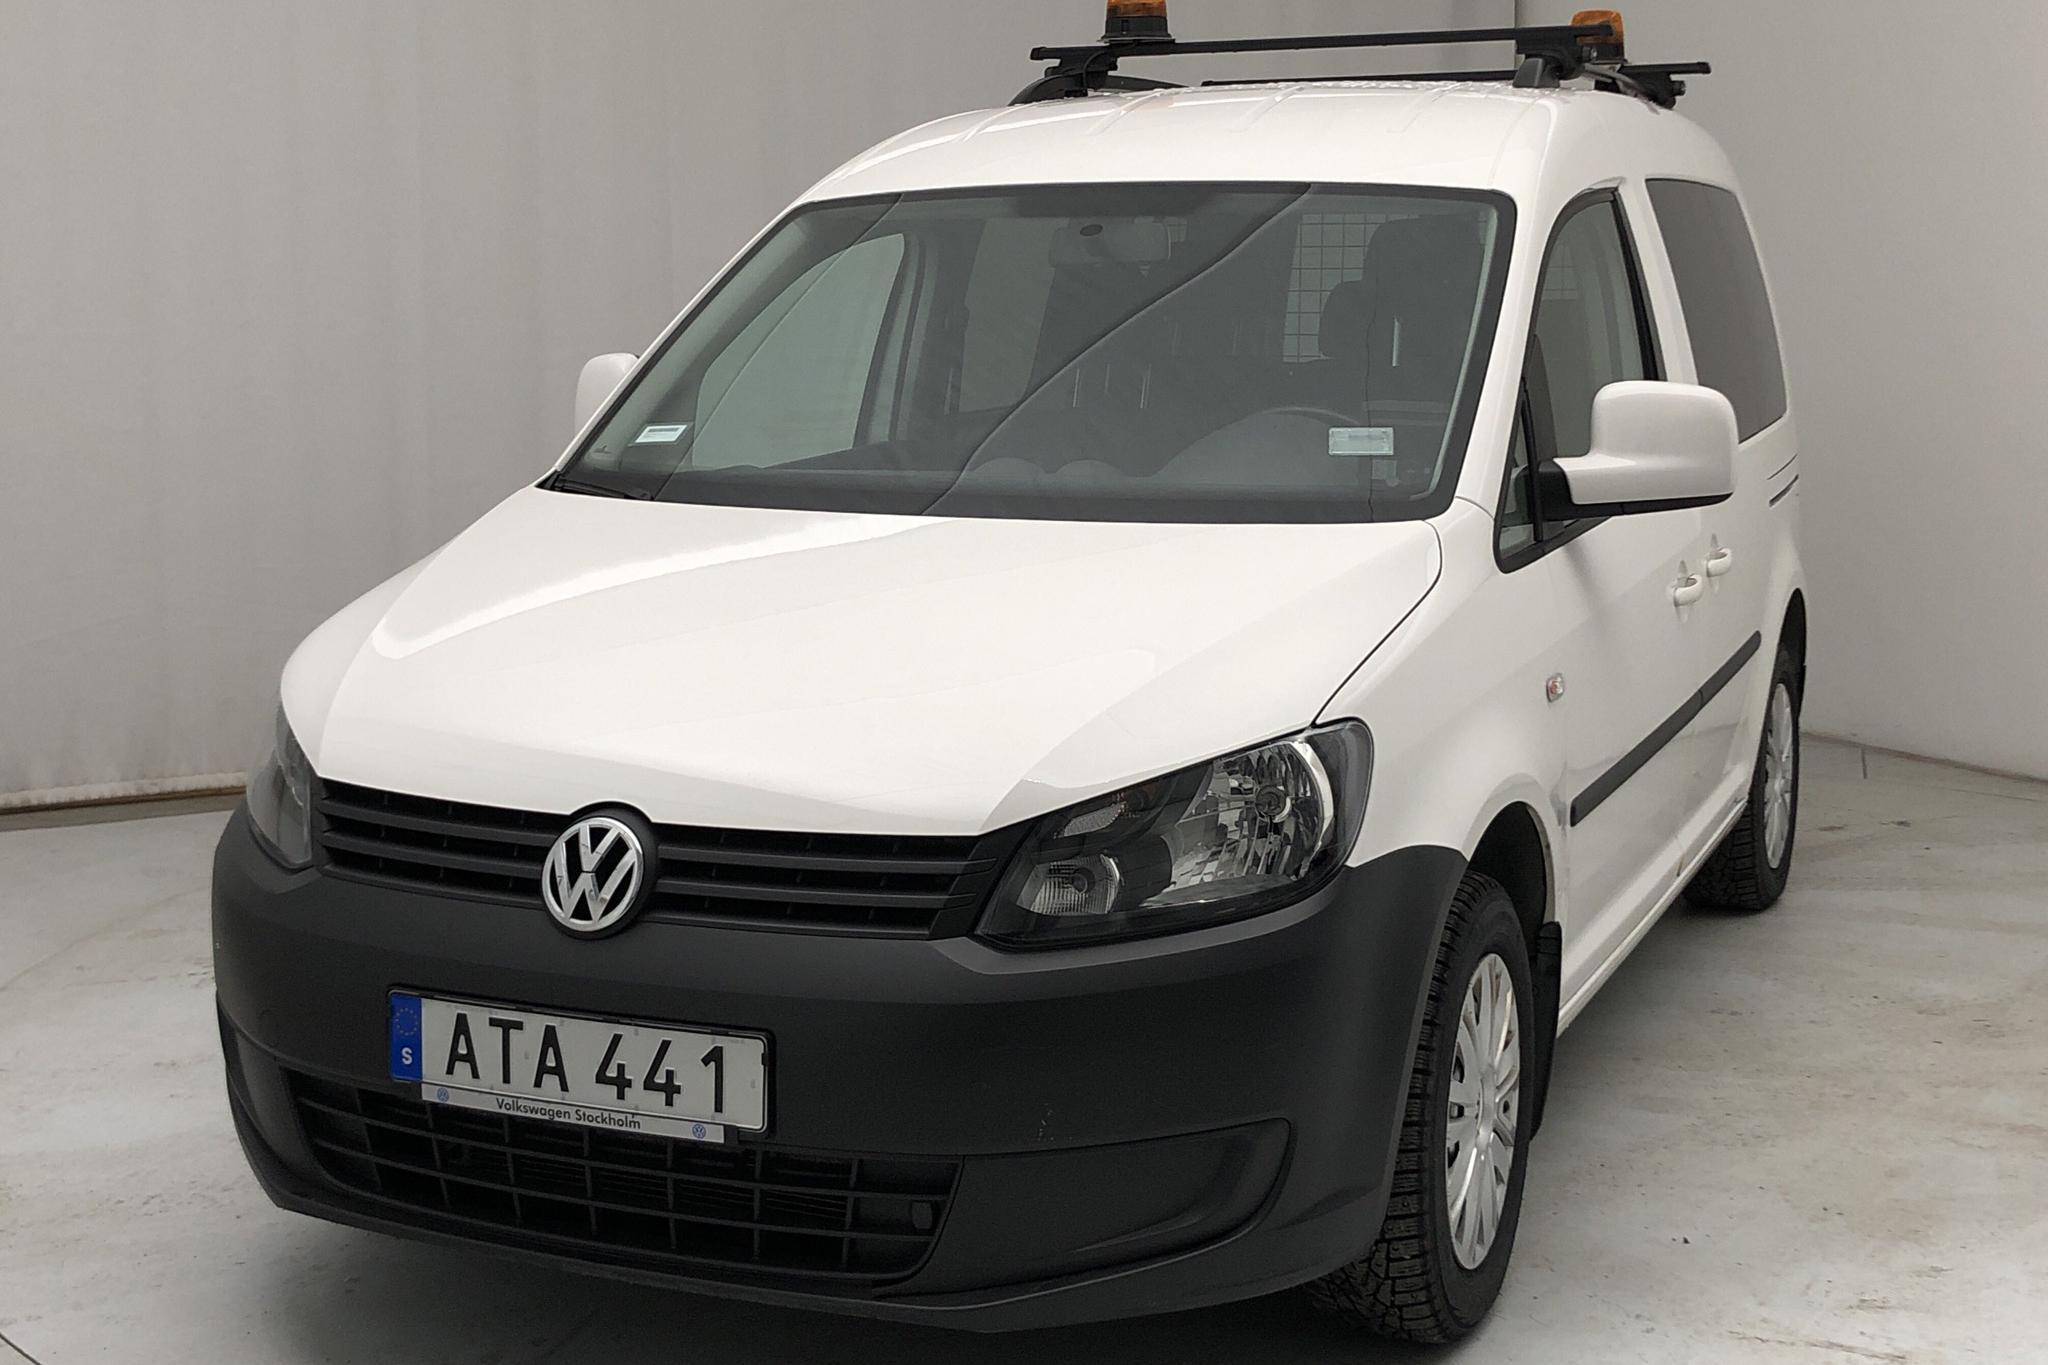 VW Caddy MPV 2.0 EcoFuel (109hk) - 4 935 mil - Manuell - gul - 2015